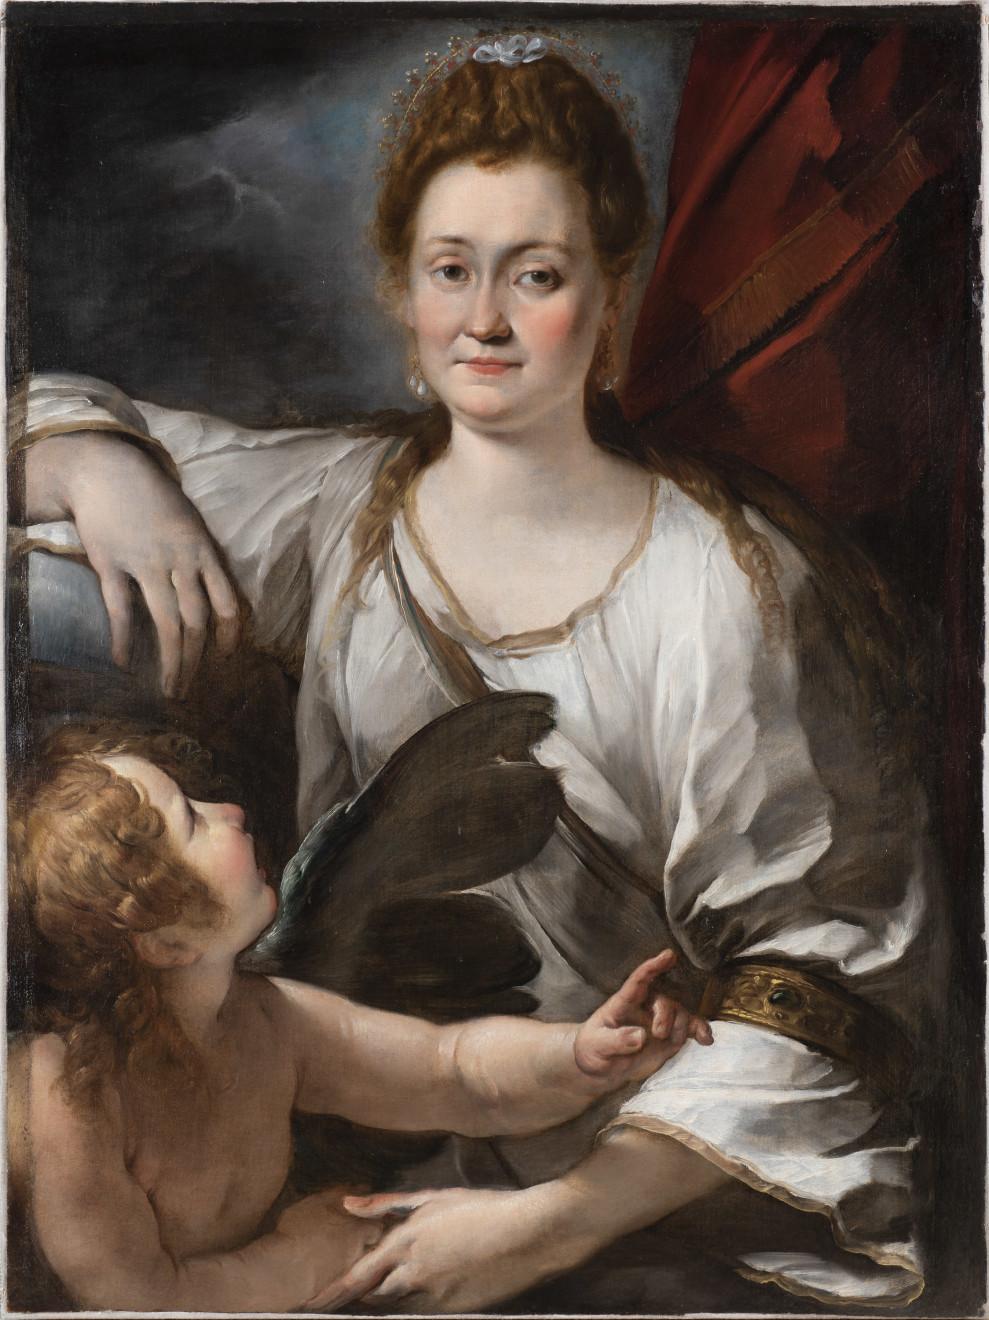 Allegorical portrait of Flaminia (Orsola Posmoni Cecchini) as Venus